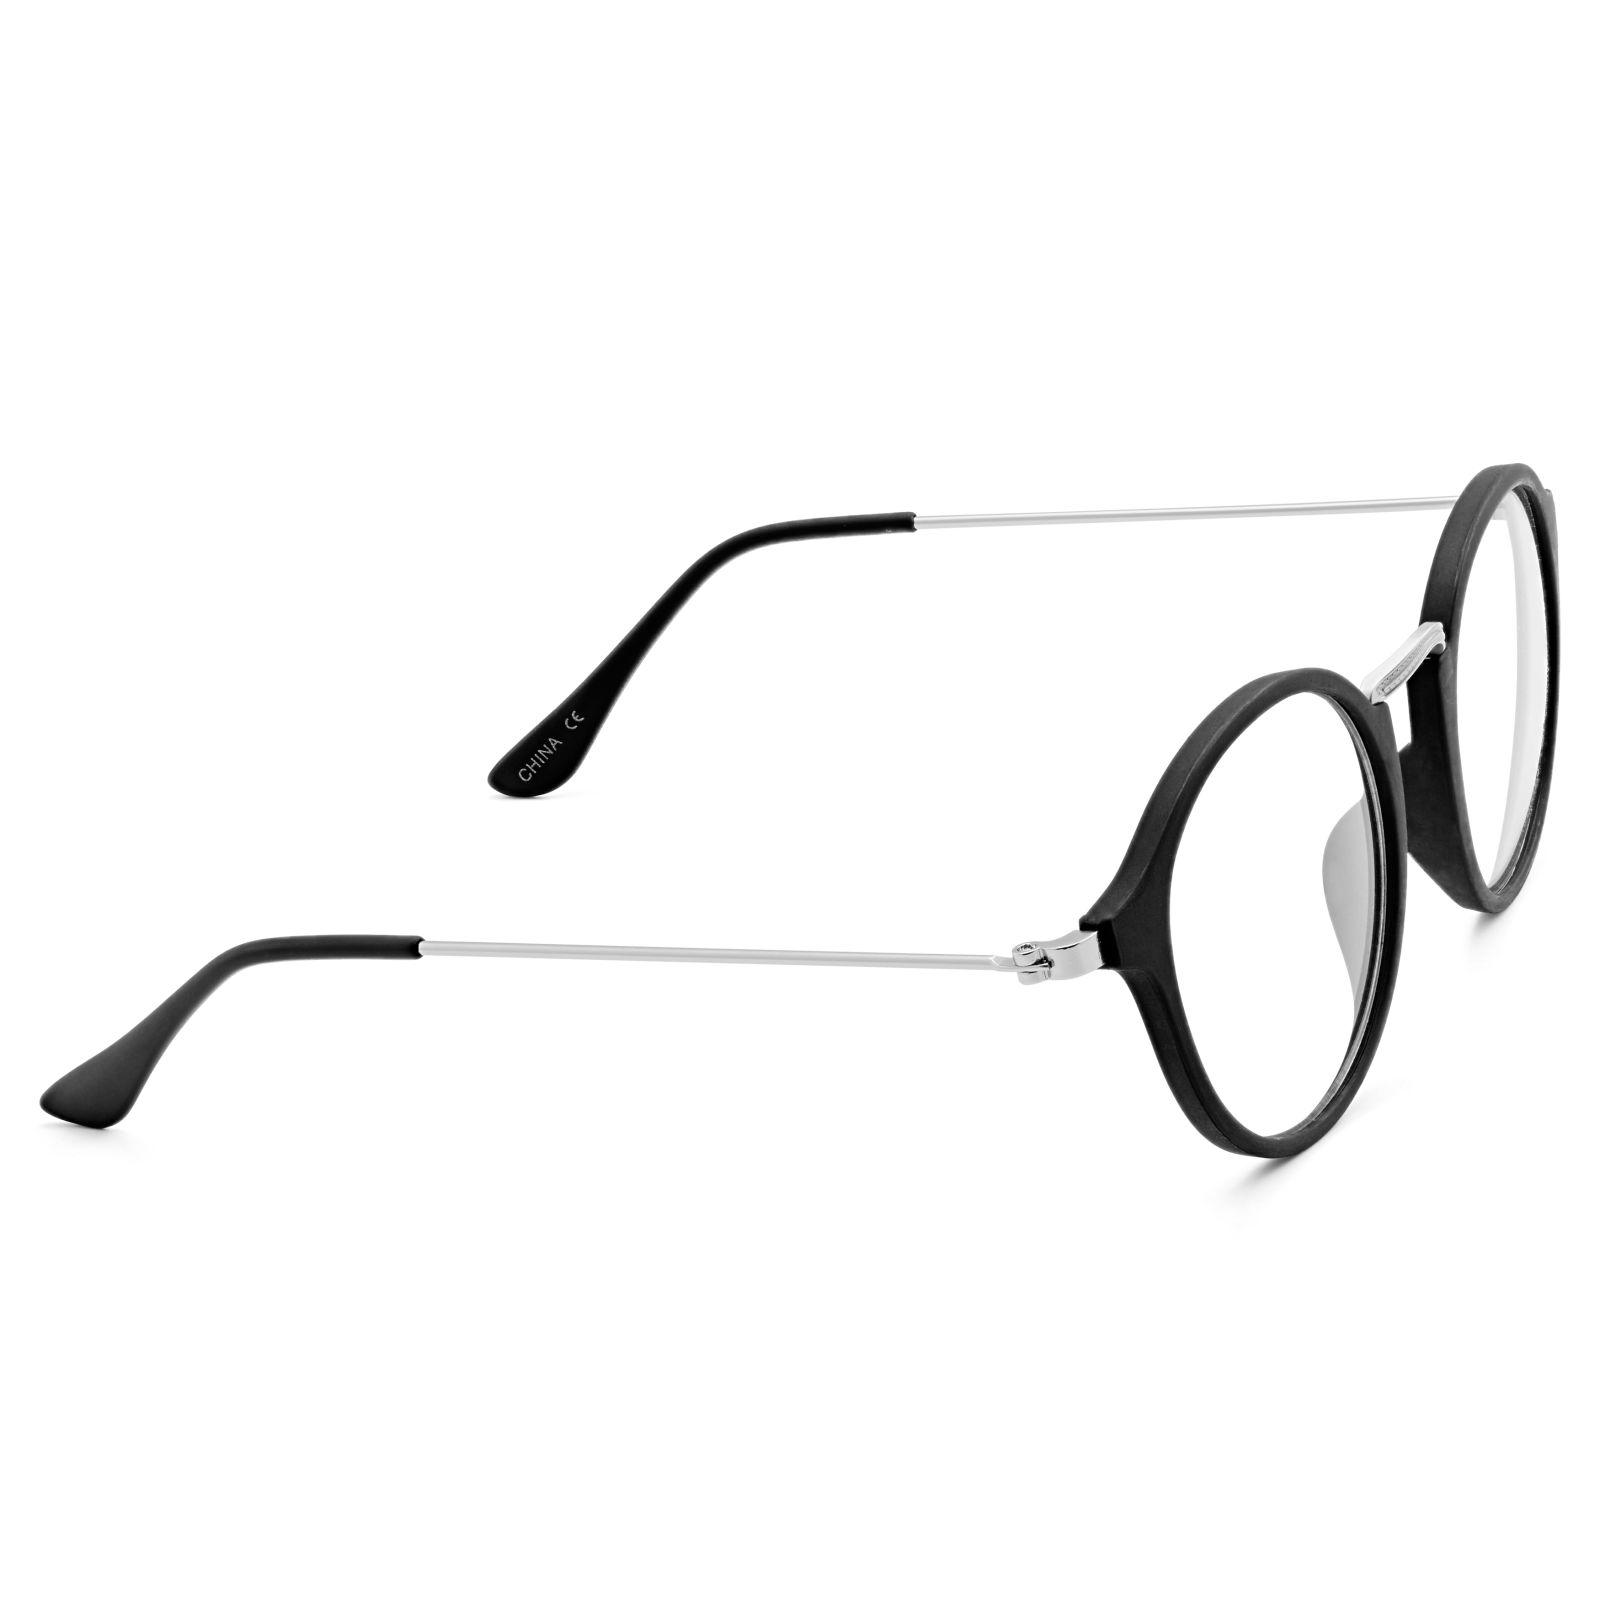 9ecf8c008 Matné čierne okuliare Scholar   Paul Riley   Na sklade!